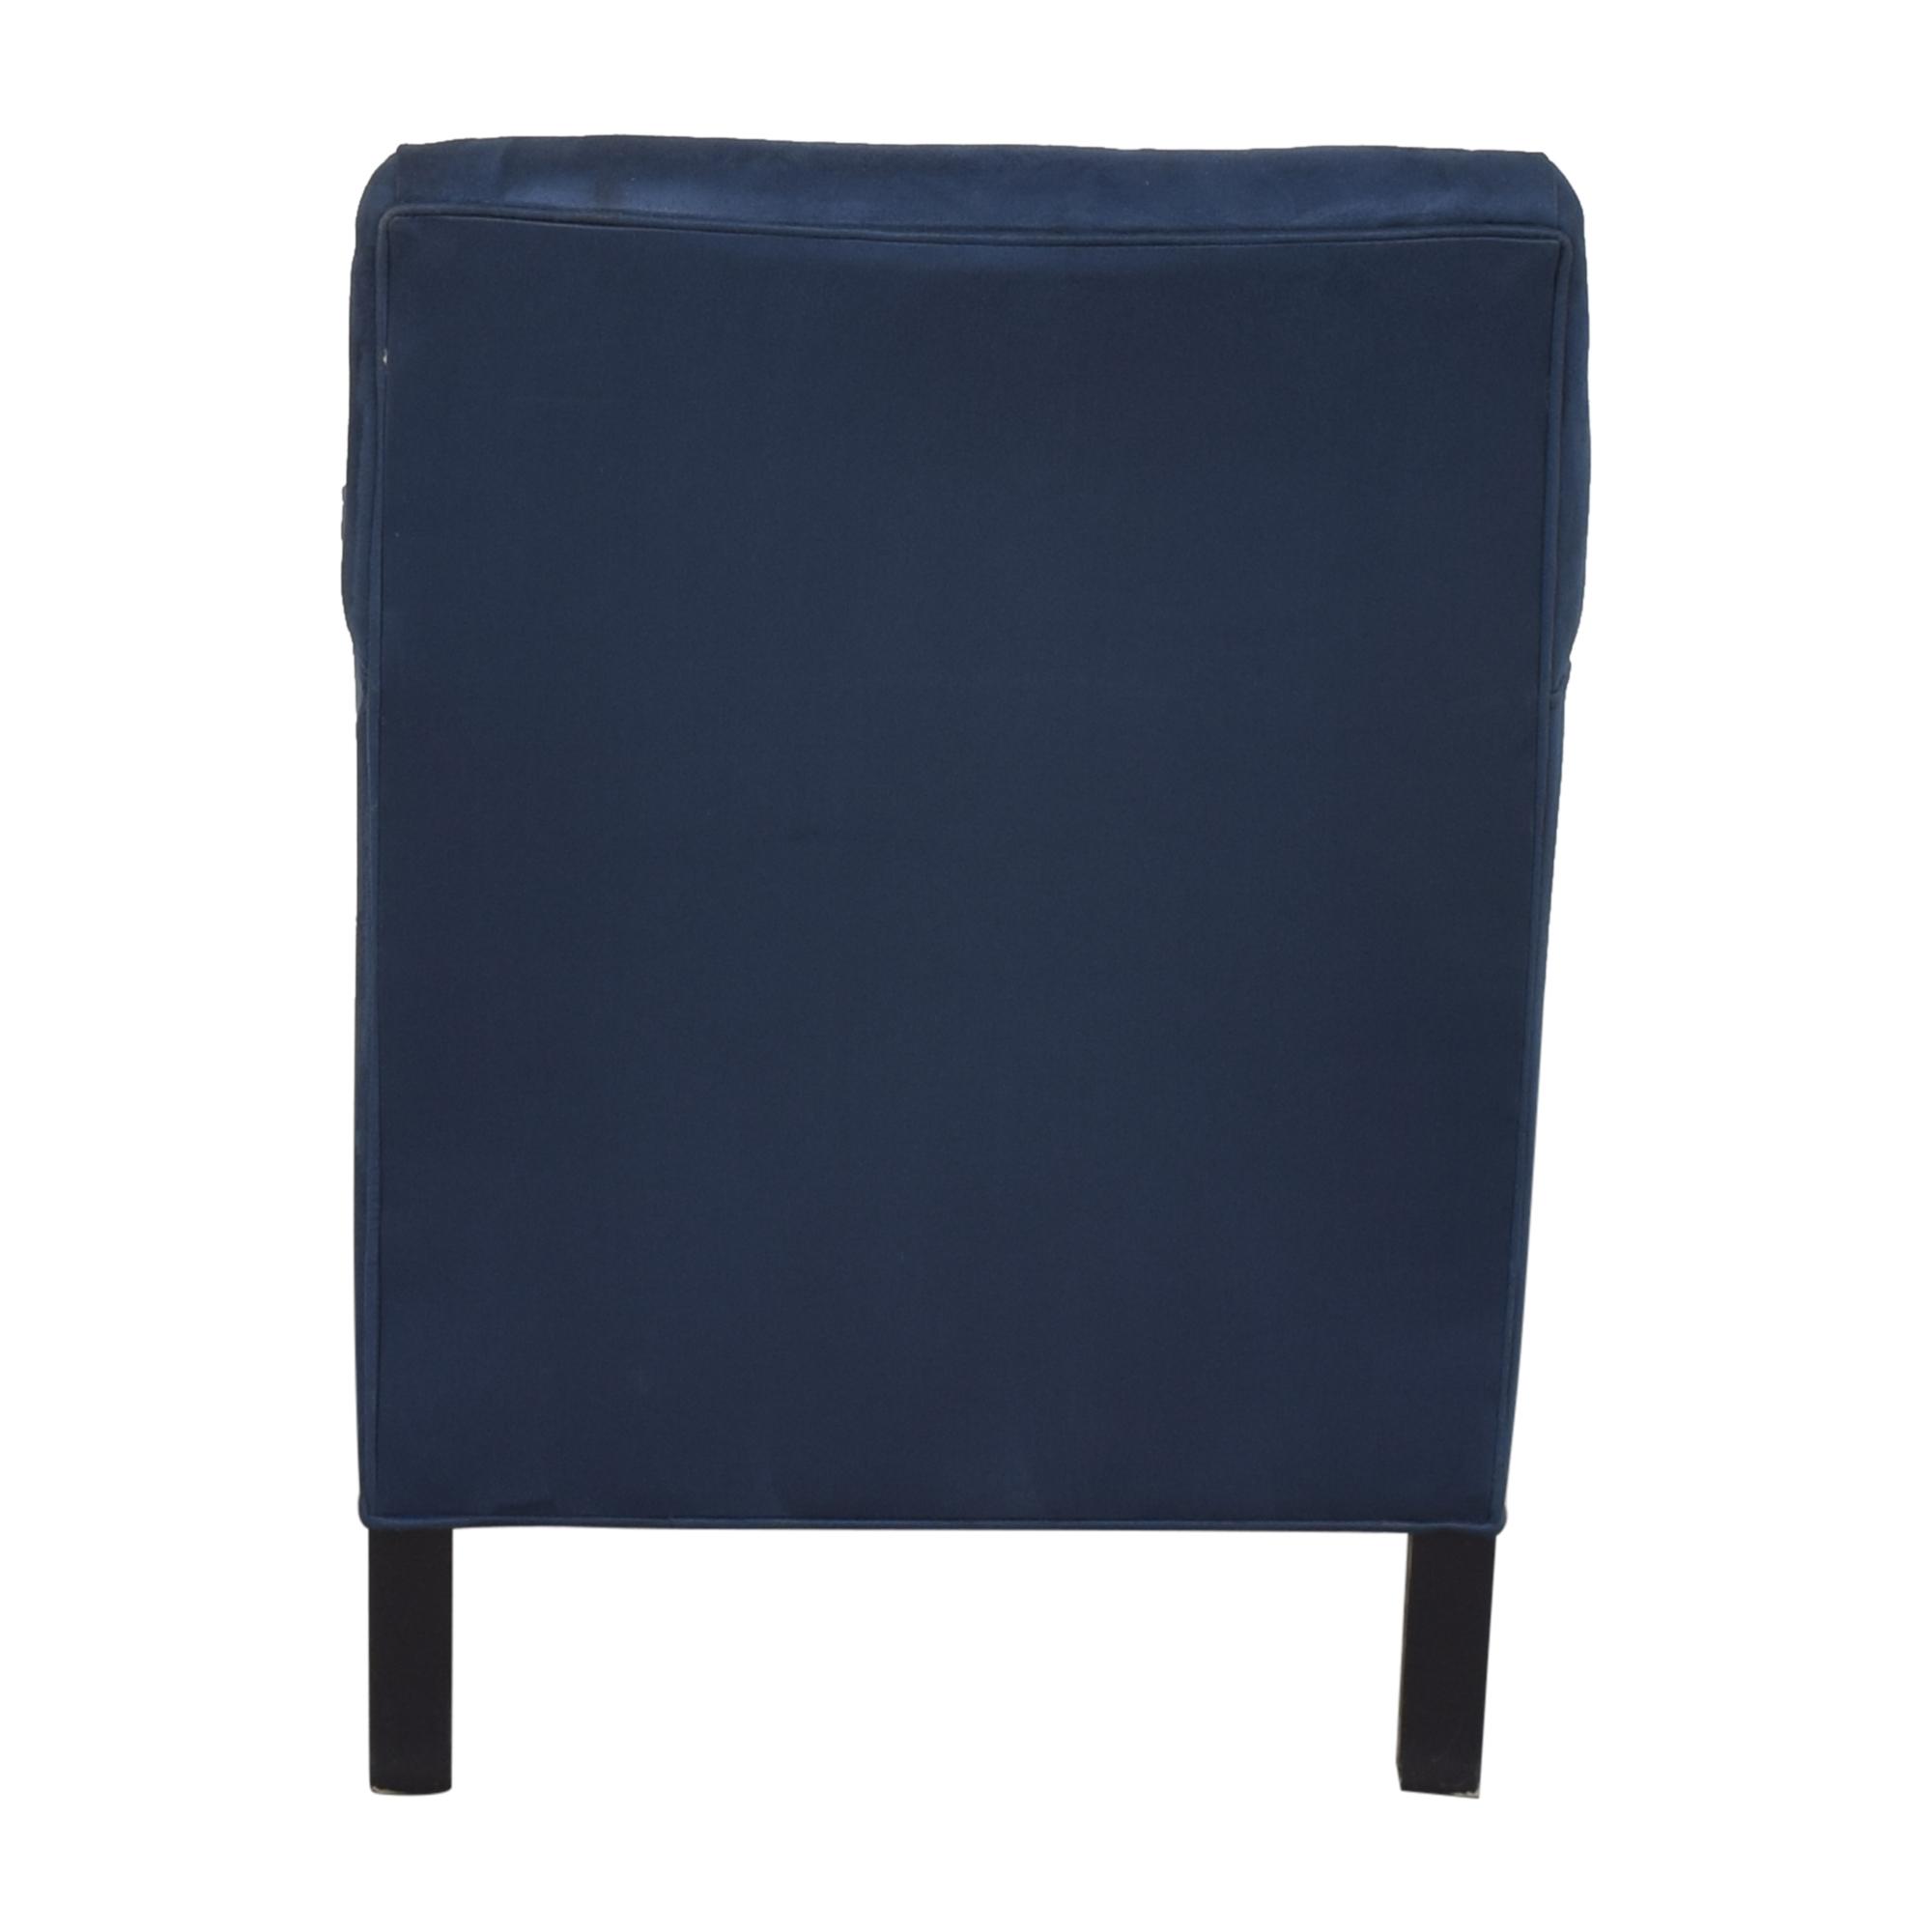 Ballard Designs Ballard Designs Accent Chair for sale